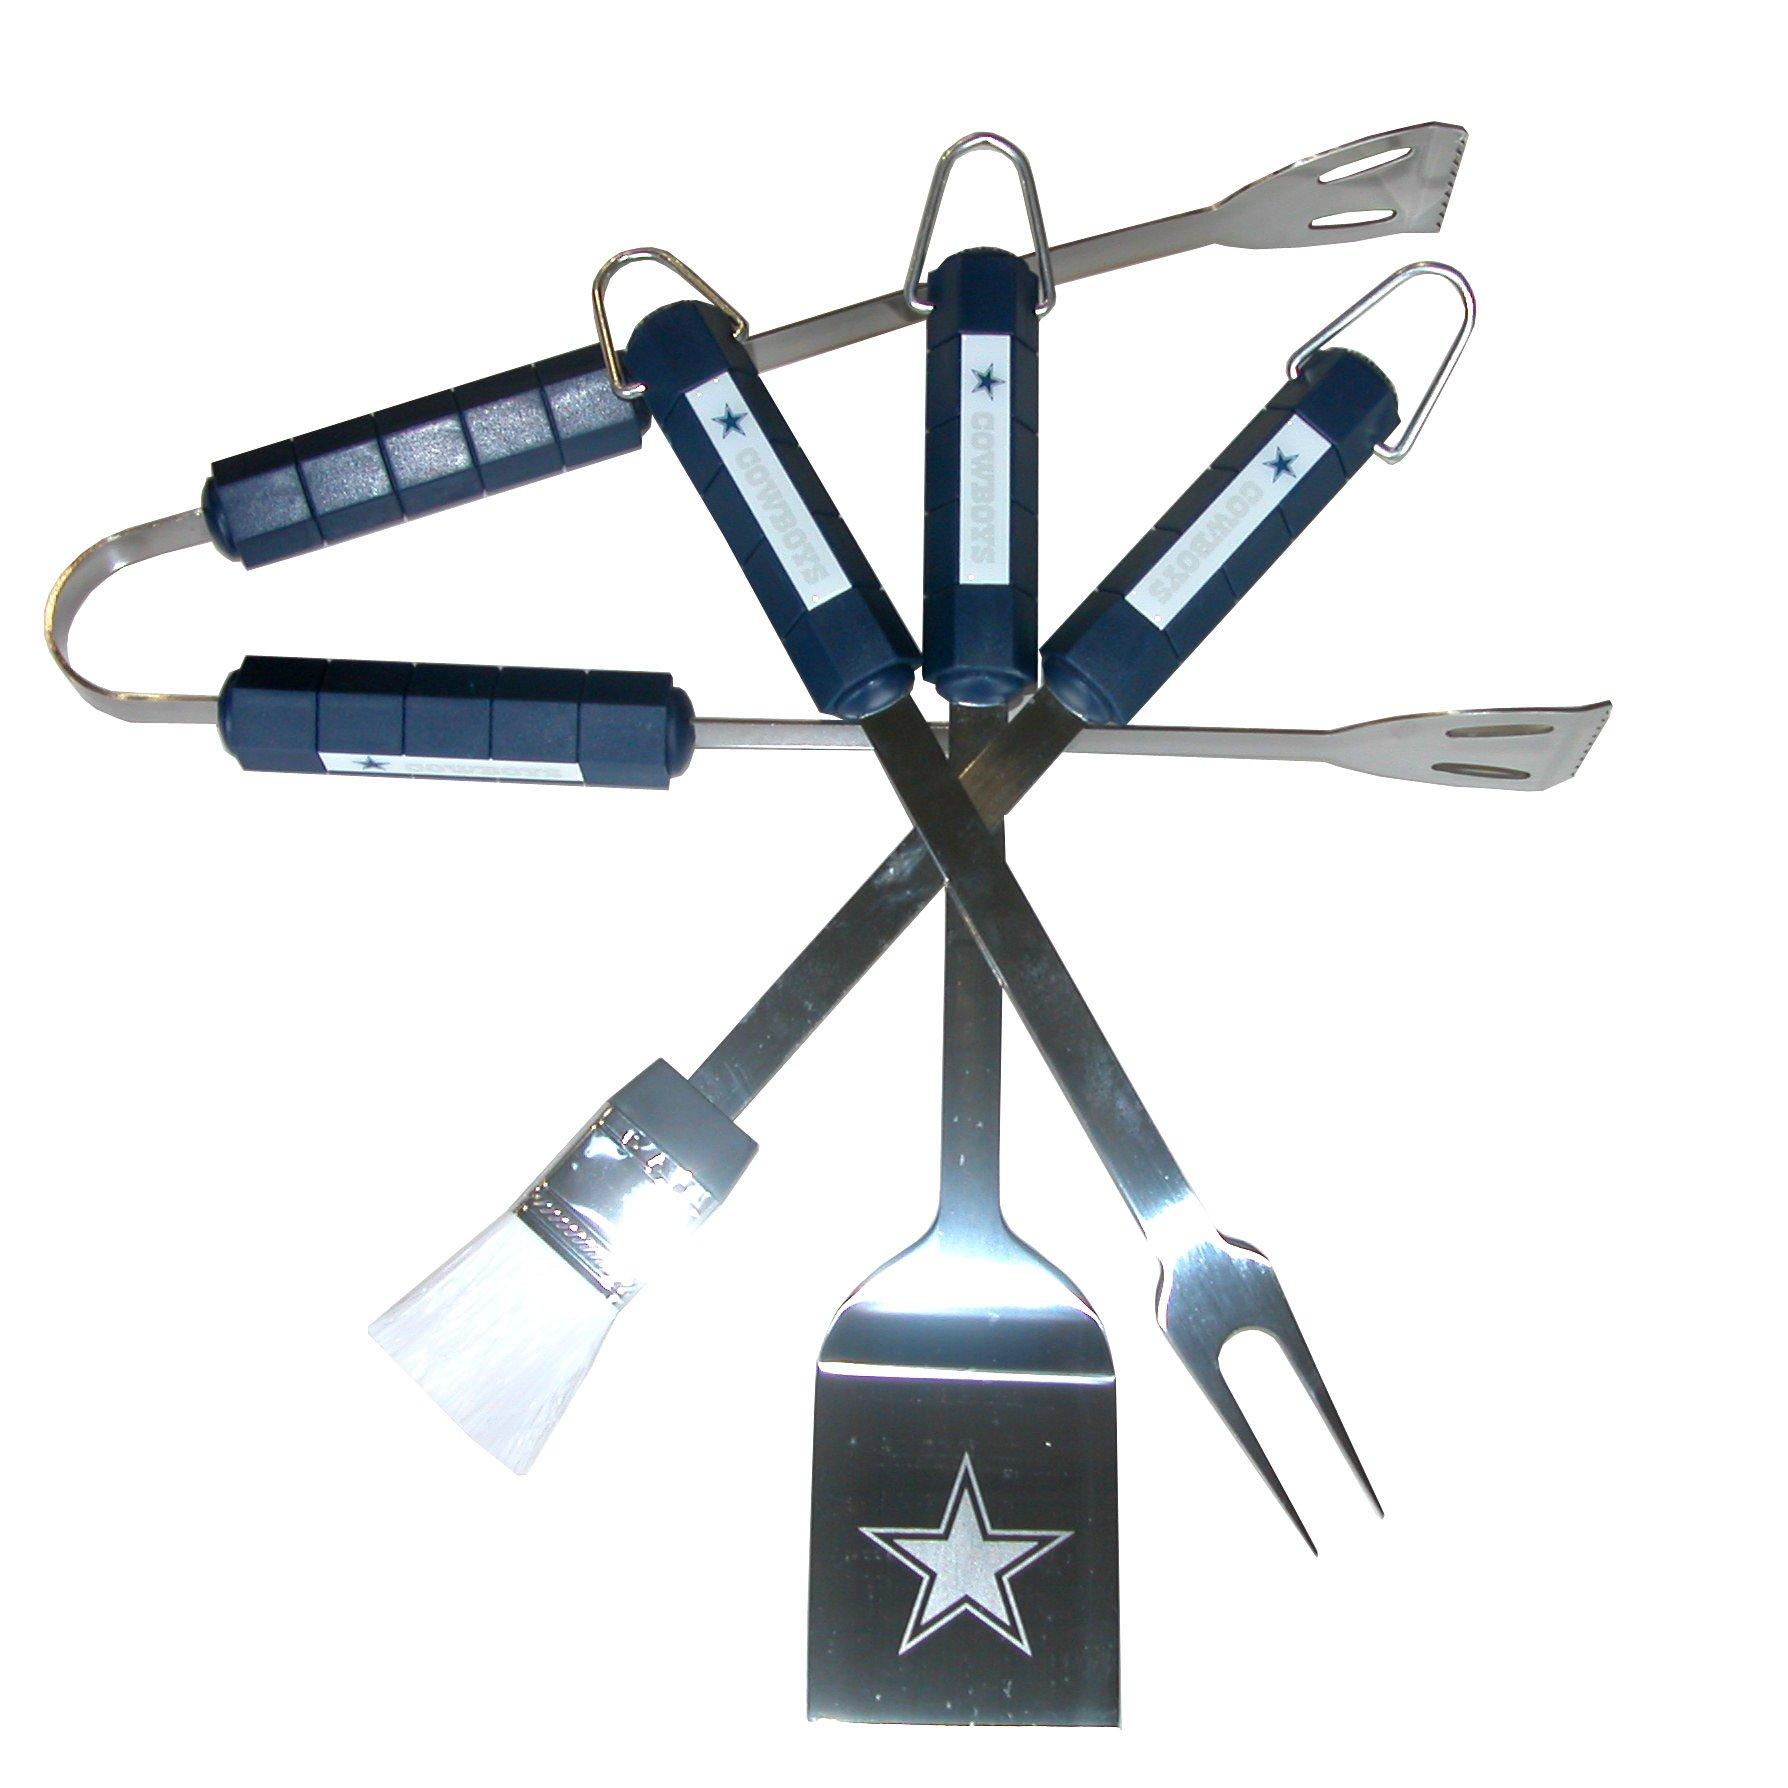 NFL Dallas Cowboys 4-Piece Barbecue Set by Siskiyou